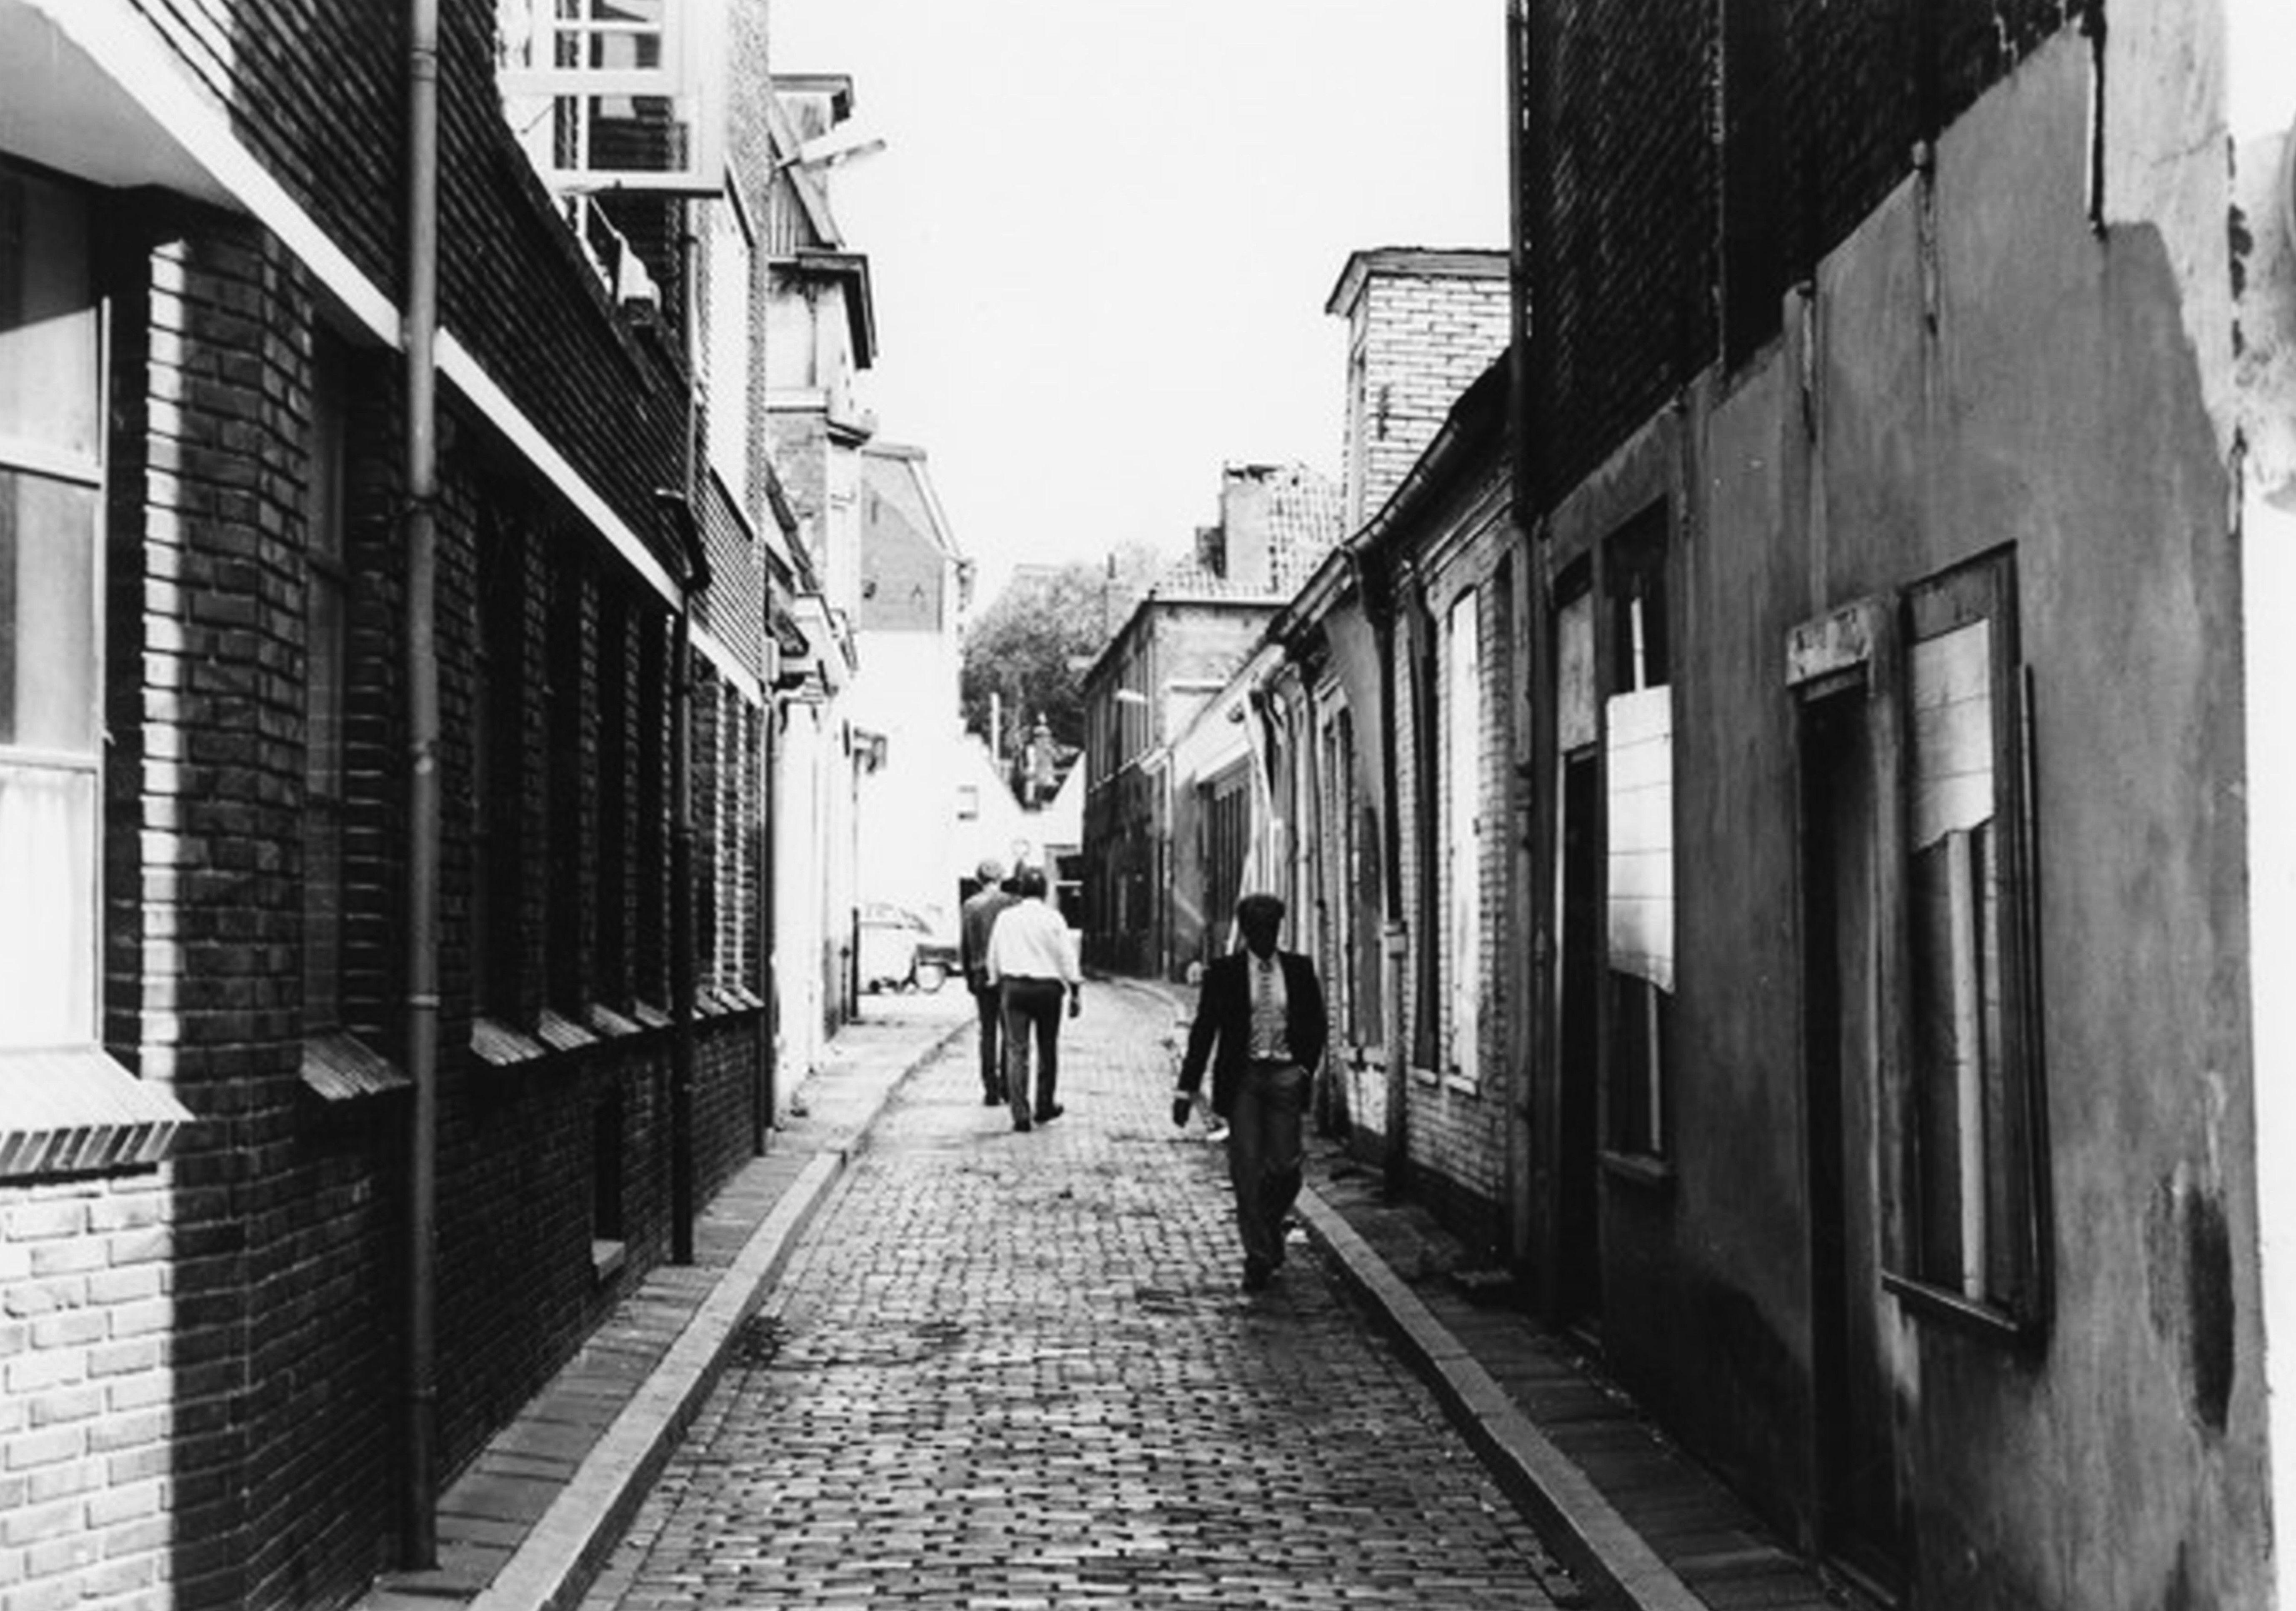 Folkingedwarsstraat 1982 Groningen, Nederland, Stad